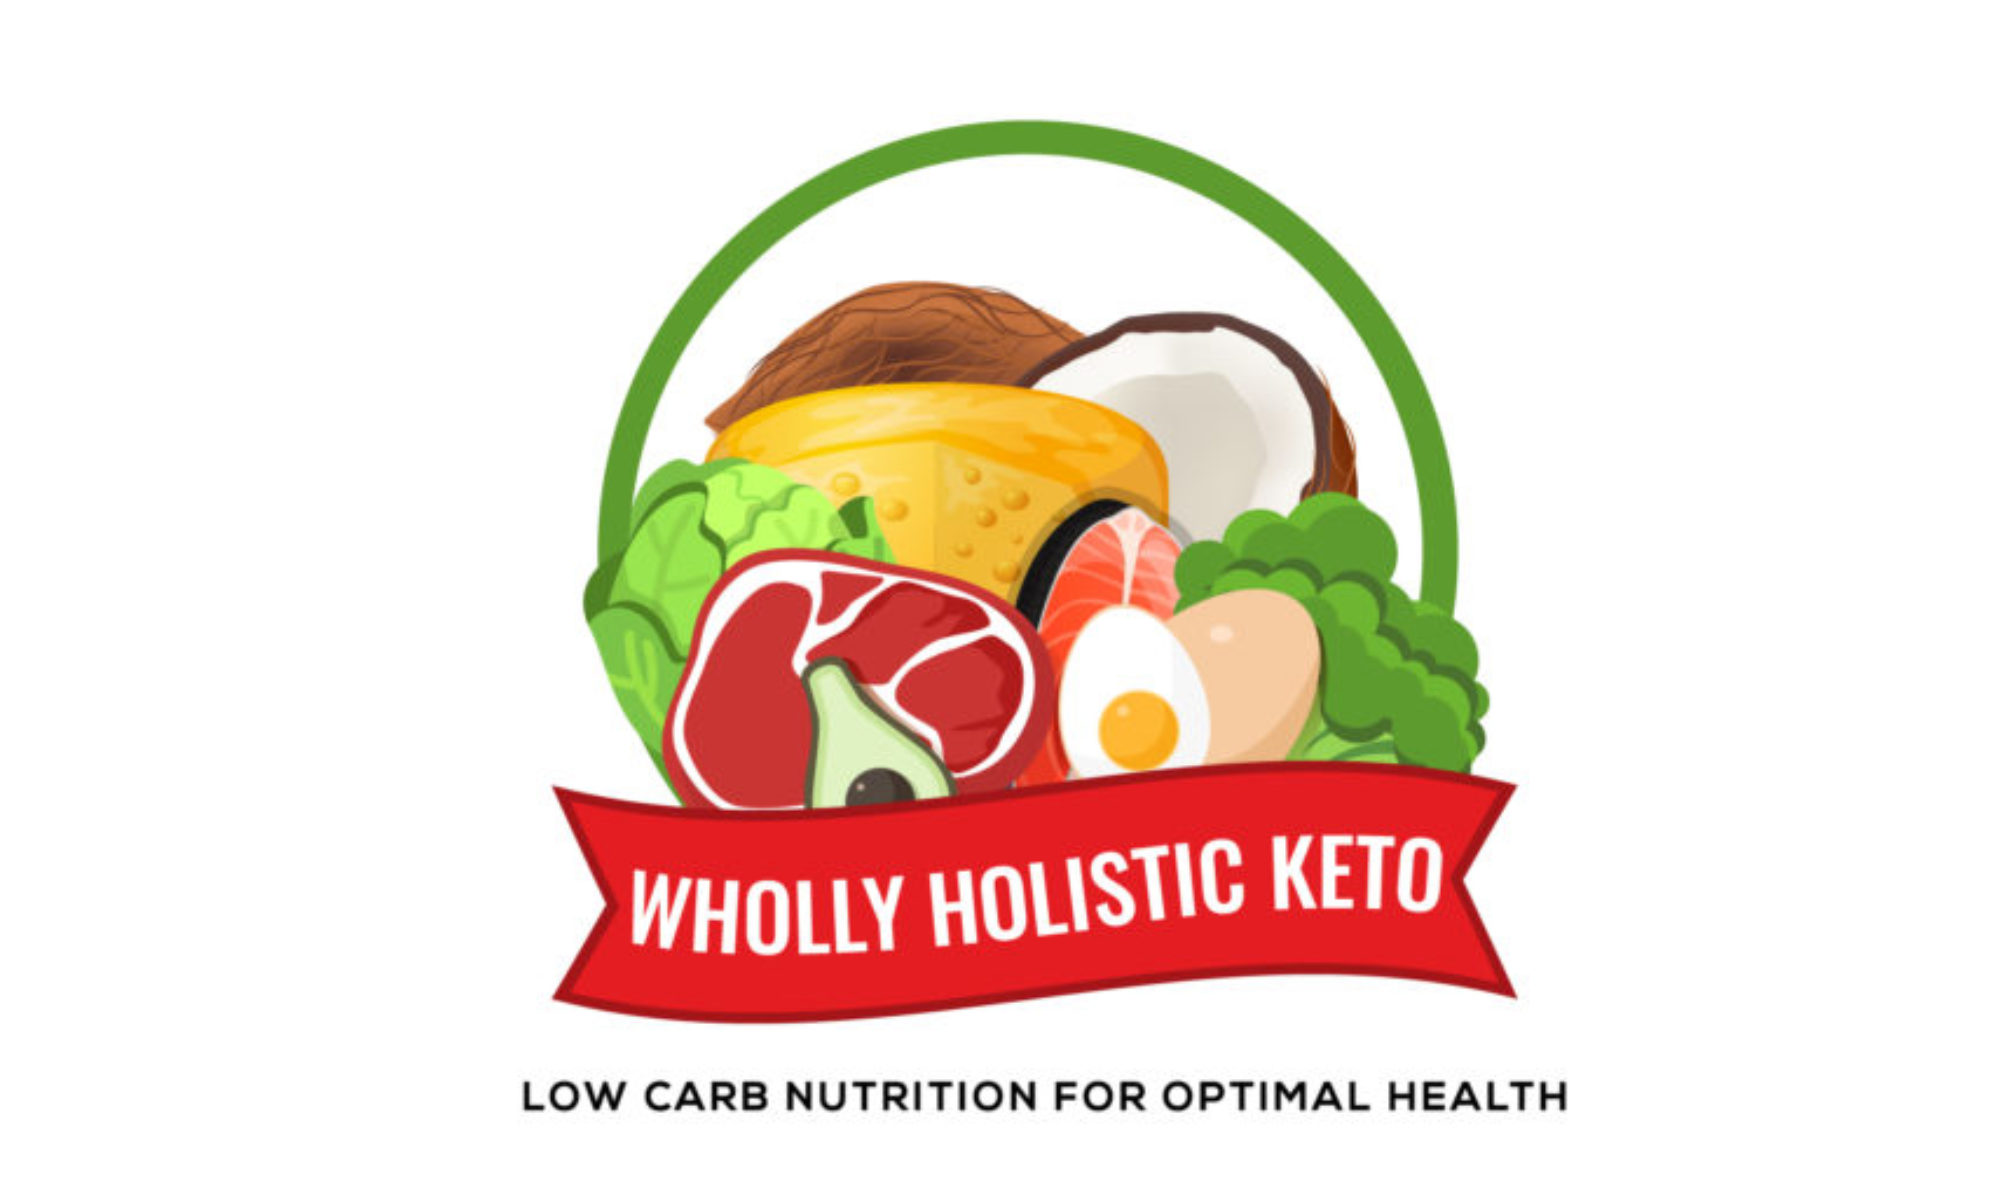 Wholly Holistic Keto